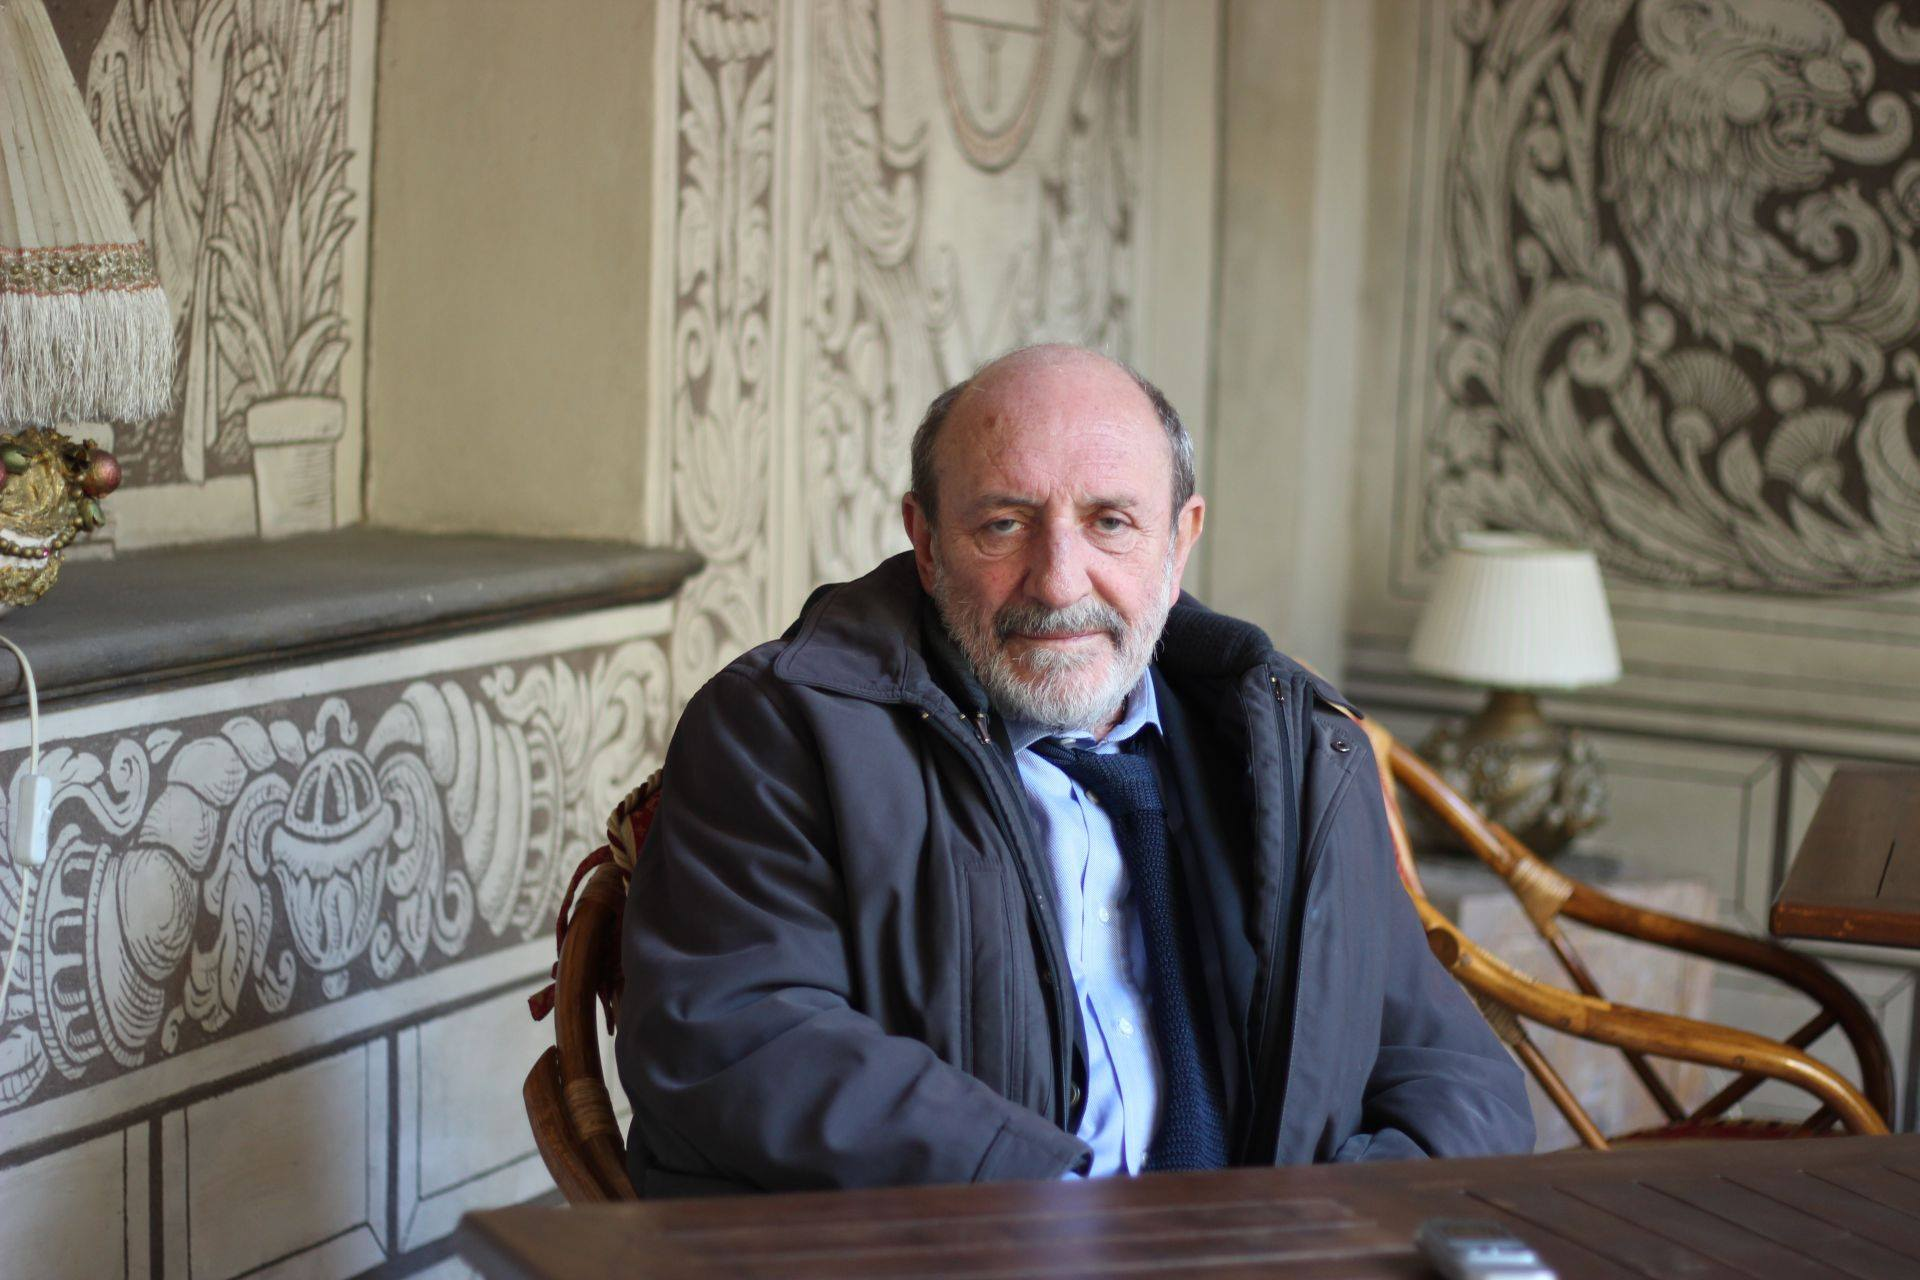 """Znepokojivý host""  Rozhovor s italským filosofem a esejistou Umbertem Galimbertim"